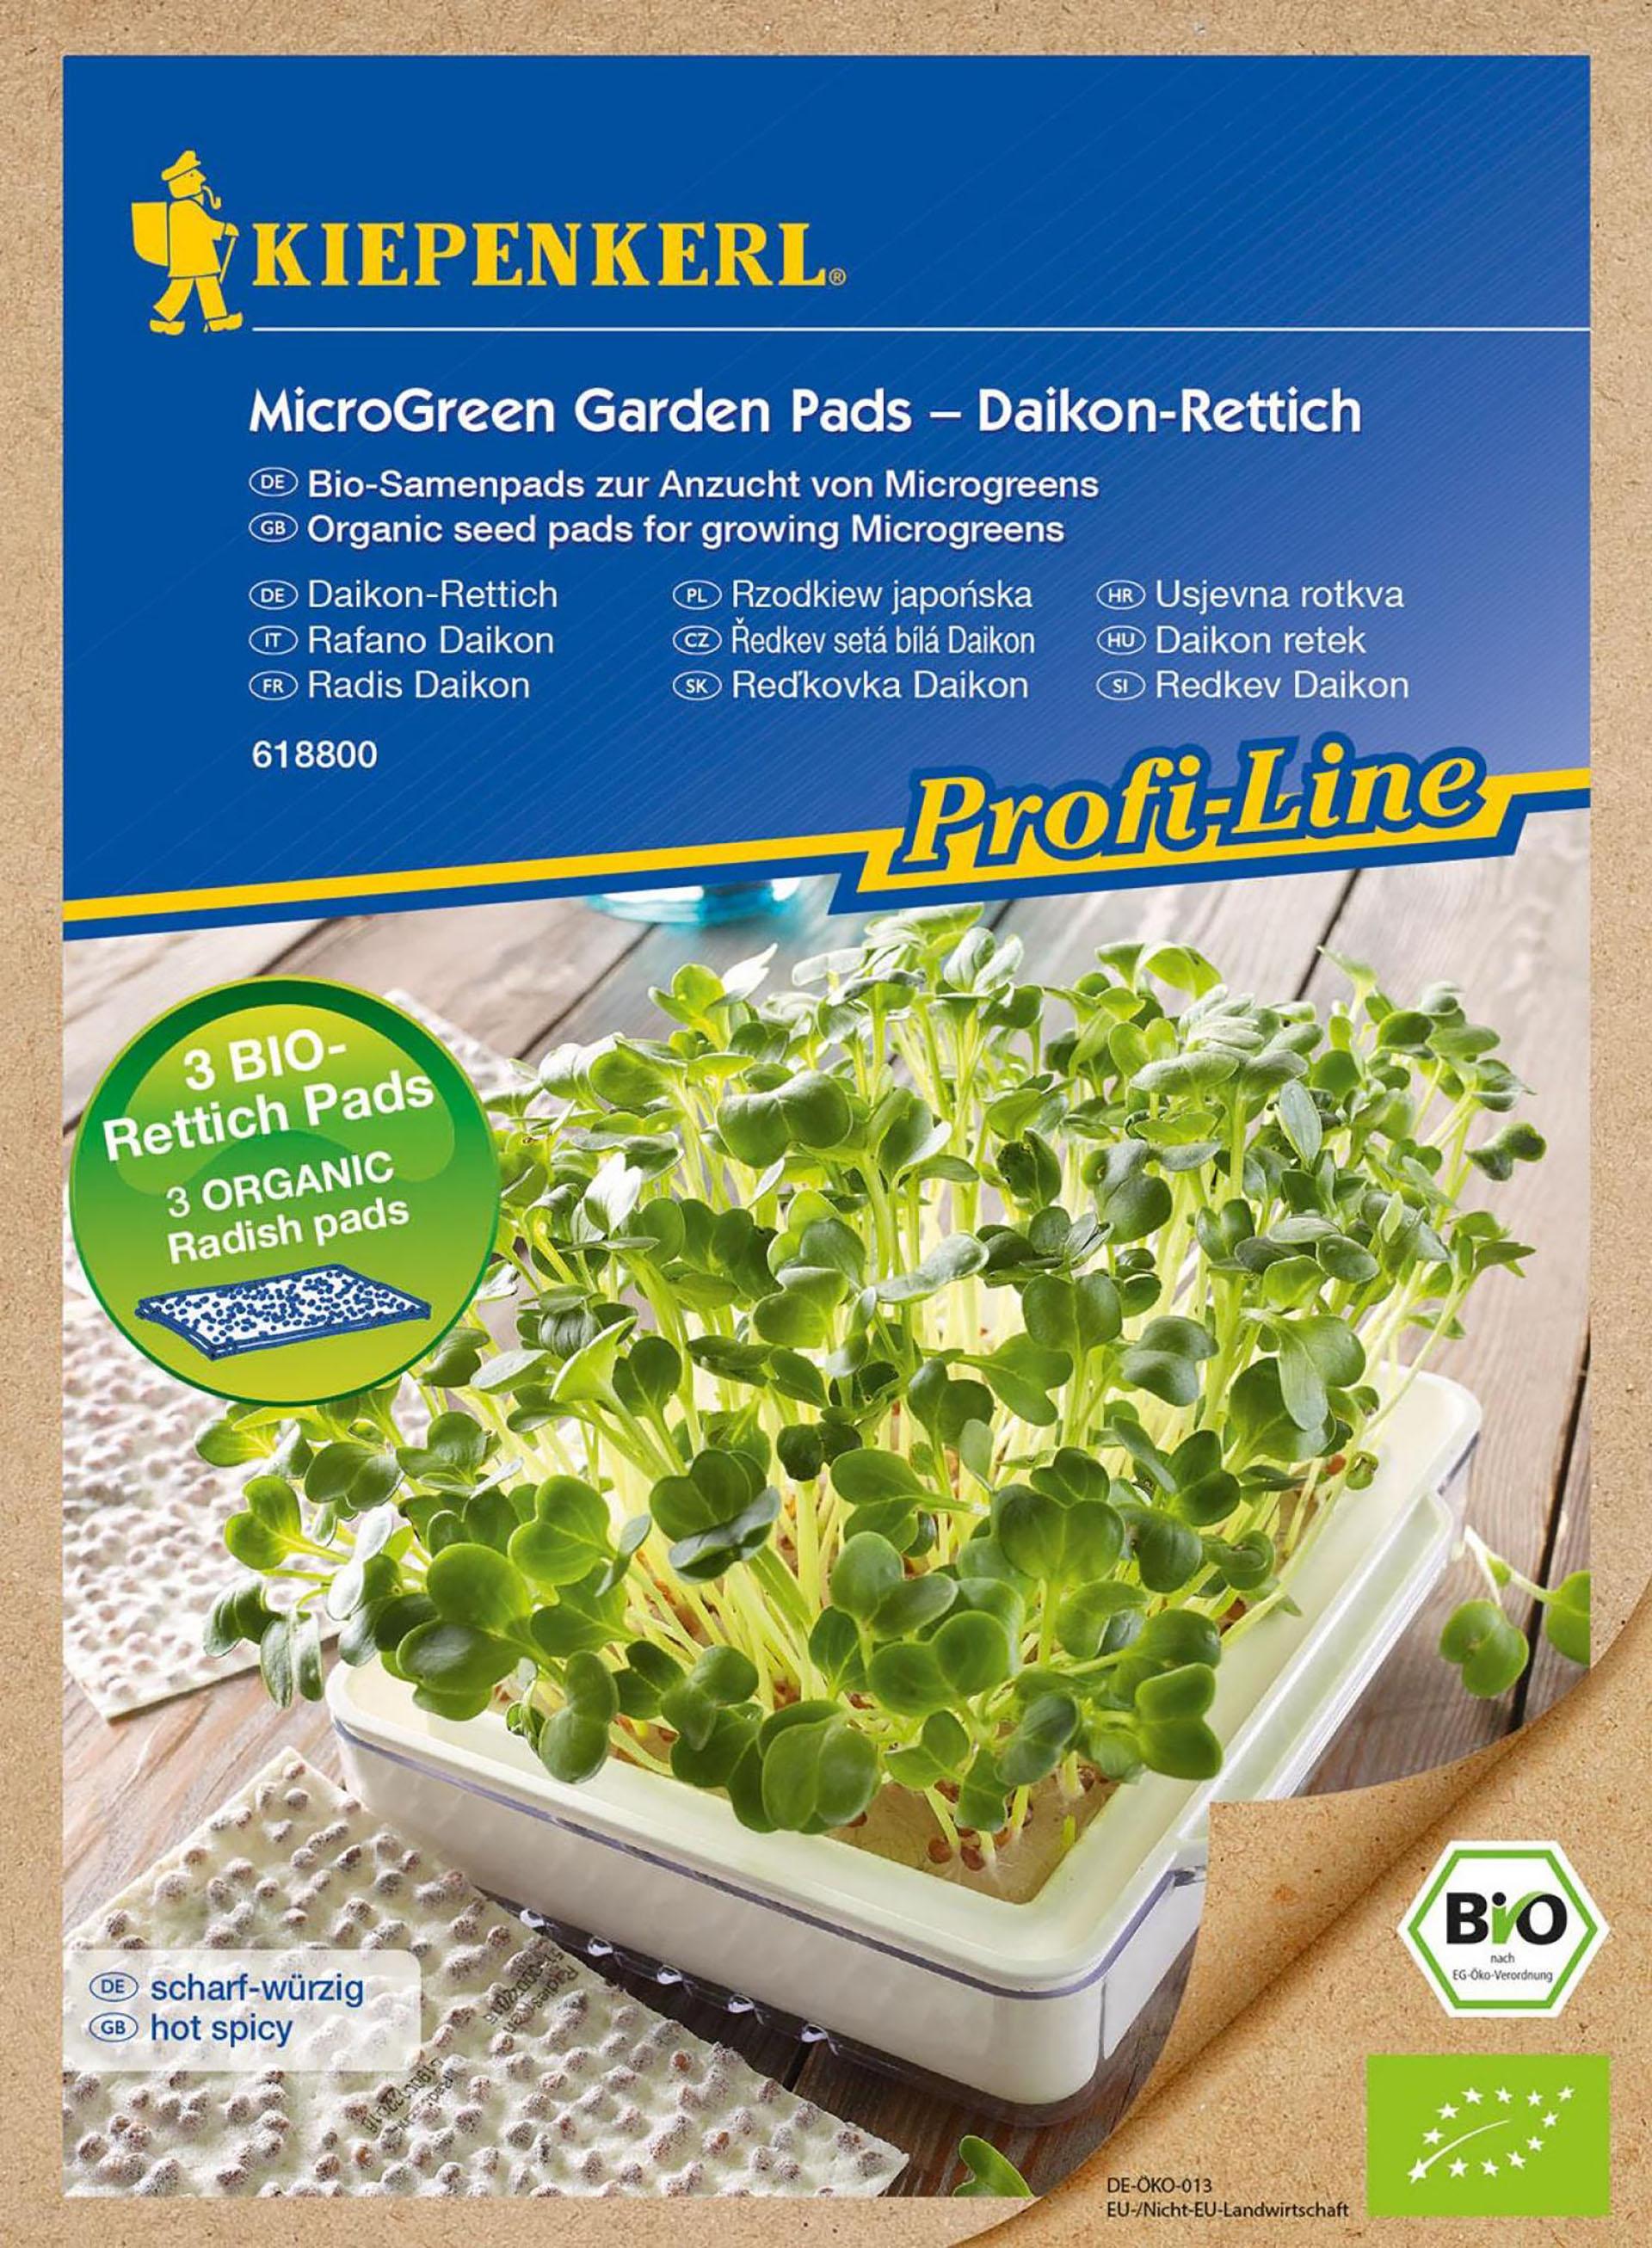 MicroGreen Garden BIO-Daikon-Rettich Nachfüllpads PG-N